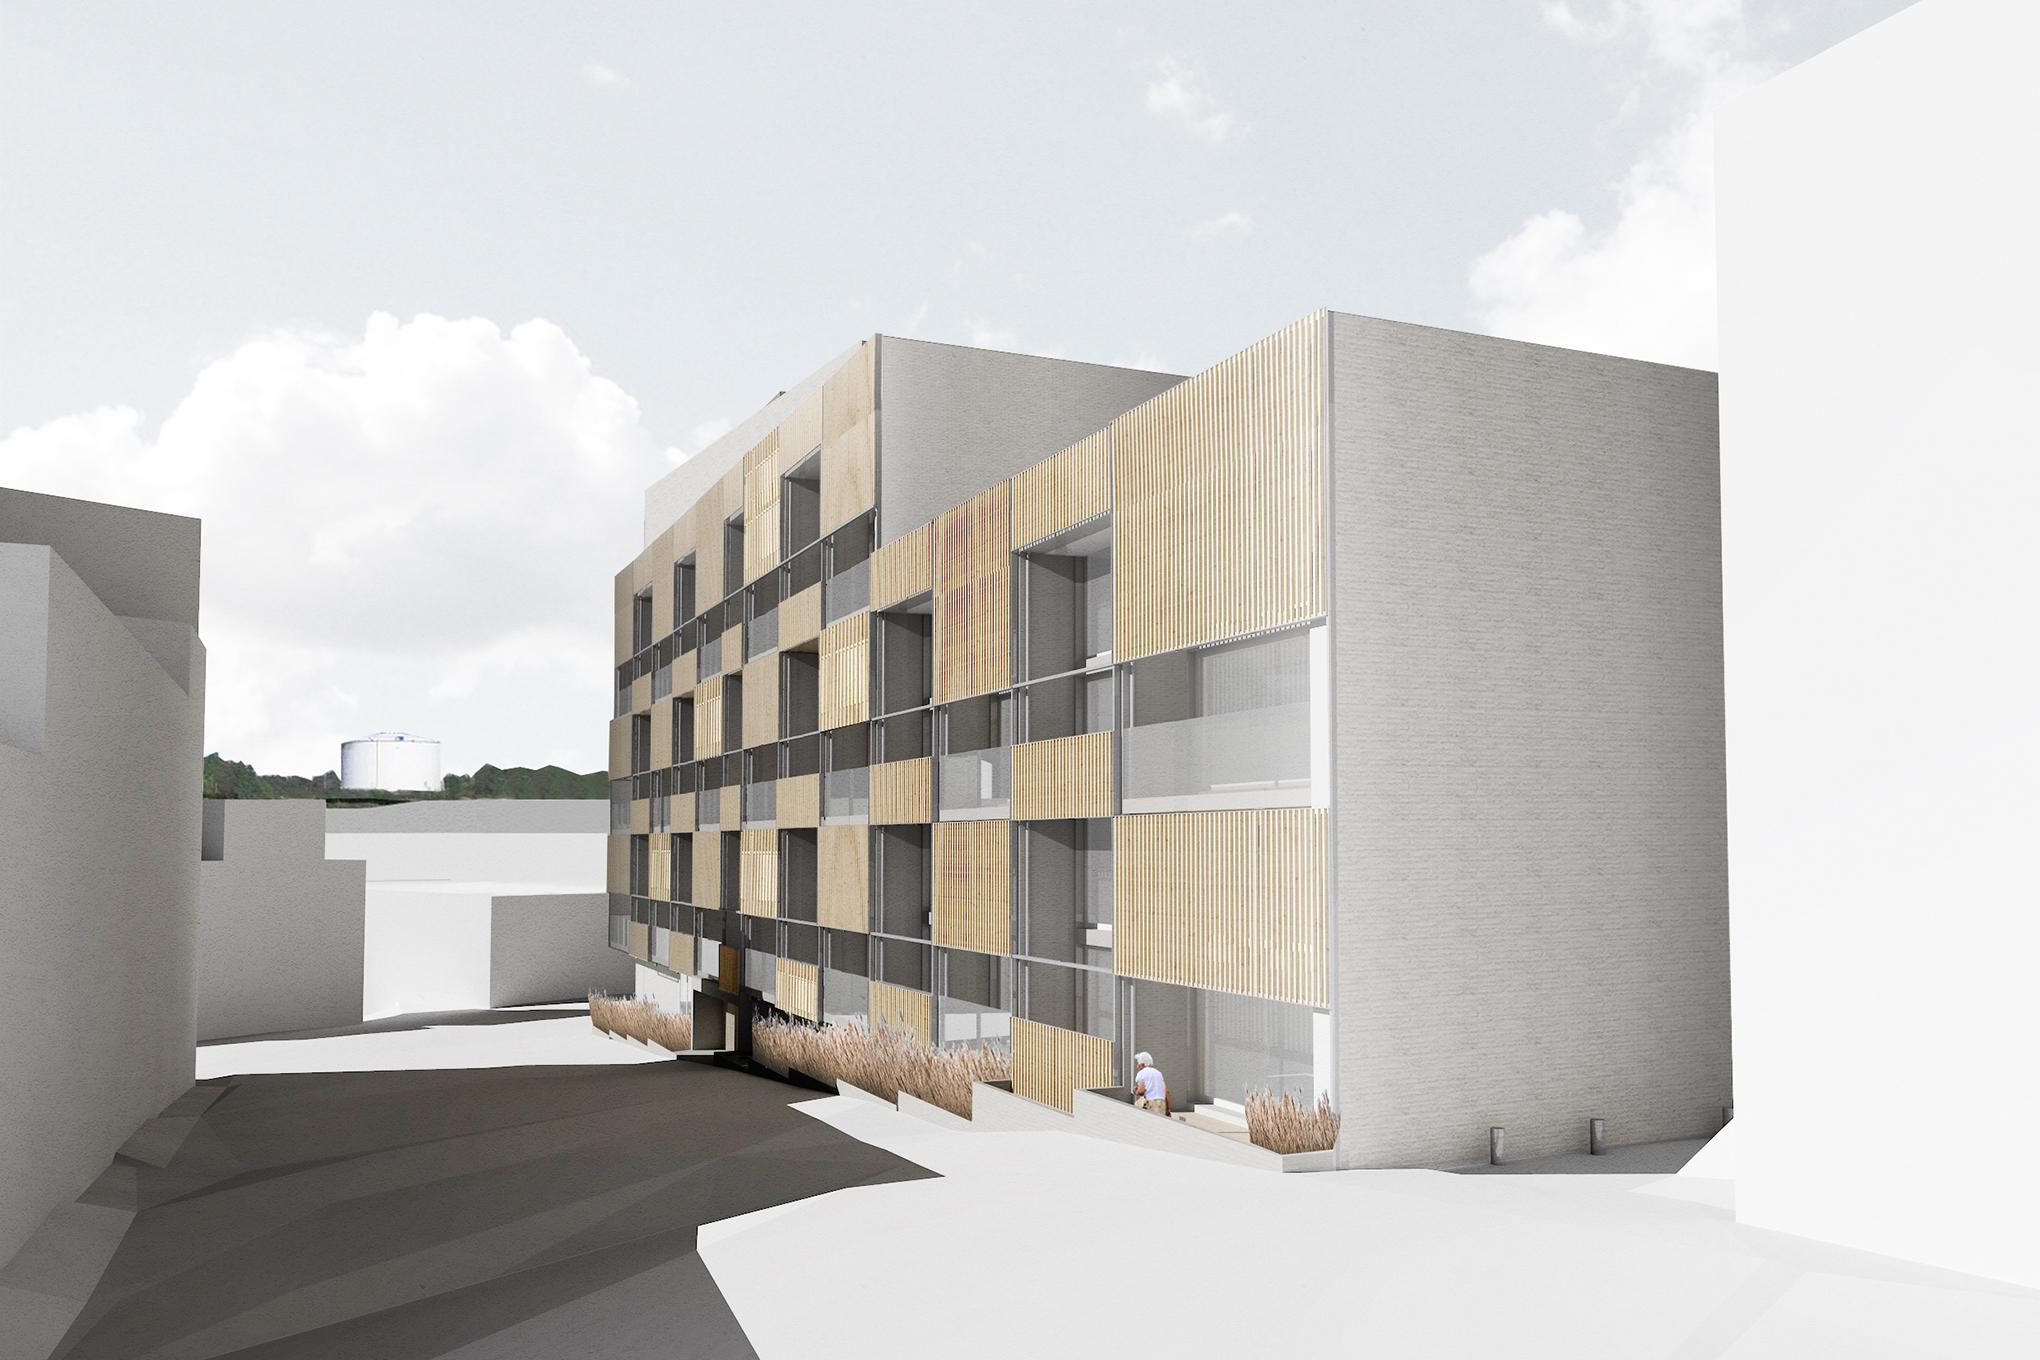 Anu Tahvanainen is planning a neo-loft block, which will be finished in Kruunuvuorenranta, Helsinki. Courtesy Anu Tahvanainen